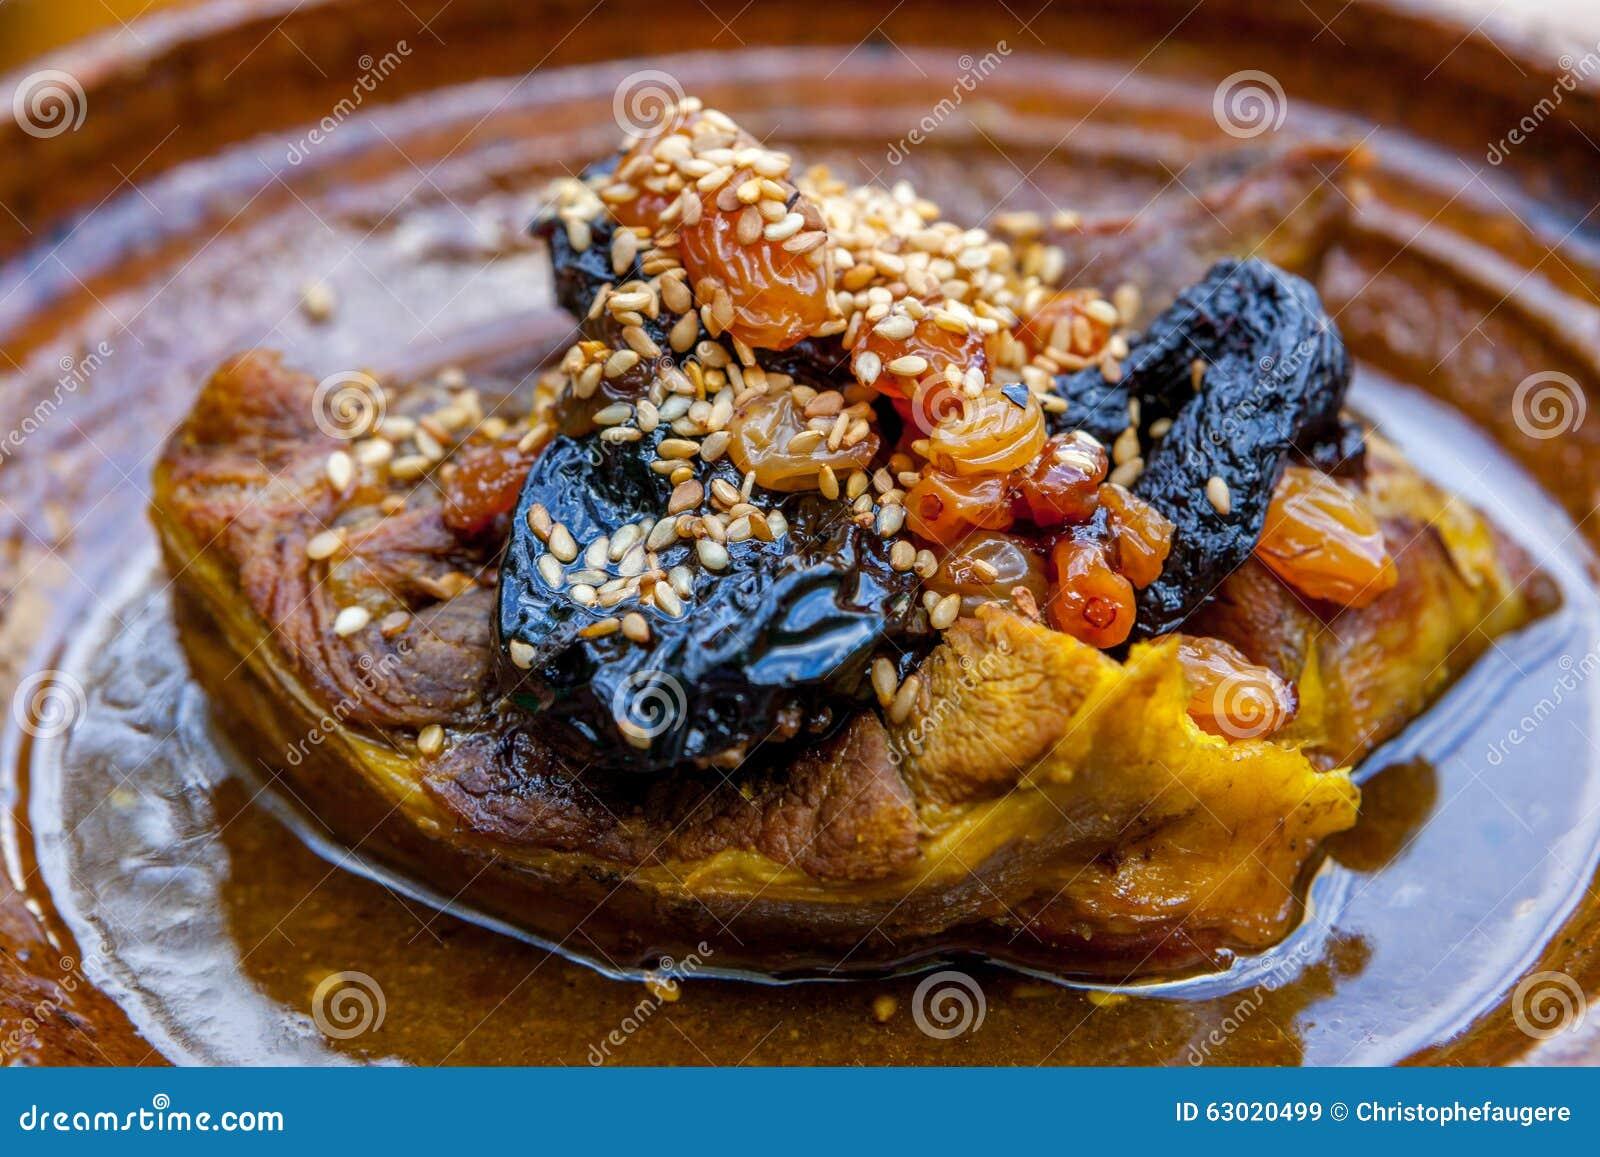 tajine moroccan typical dish stock photo image 63020499. Black Bedroom Furniture Sets. Home Design Ideas